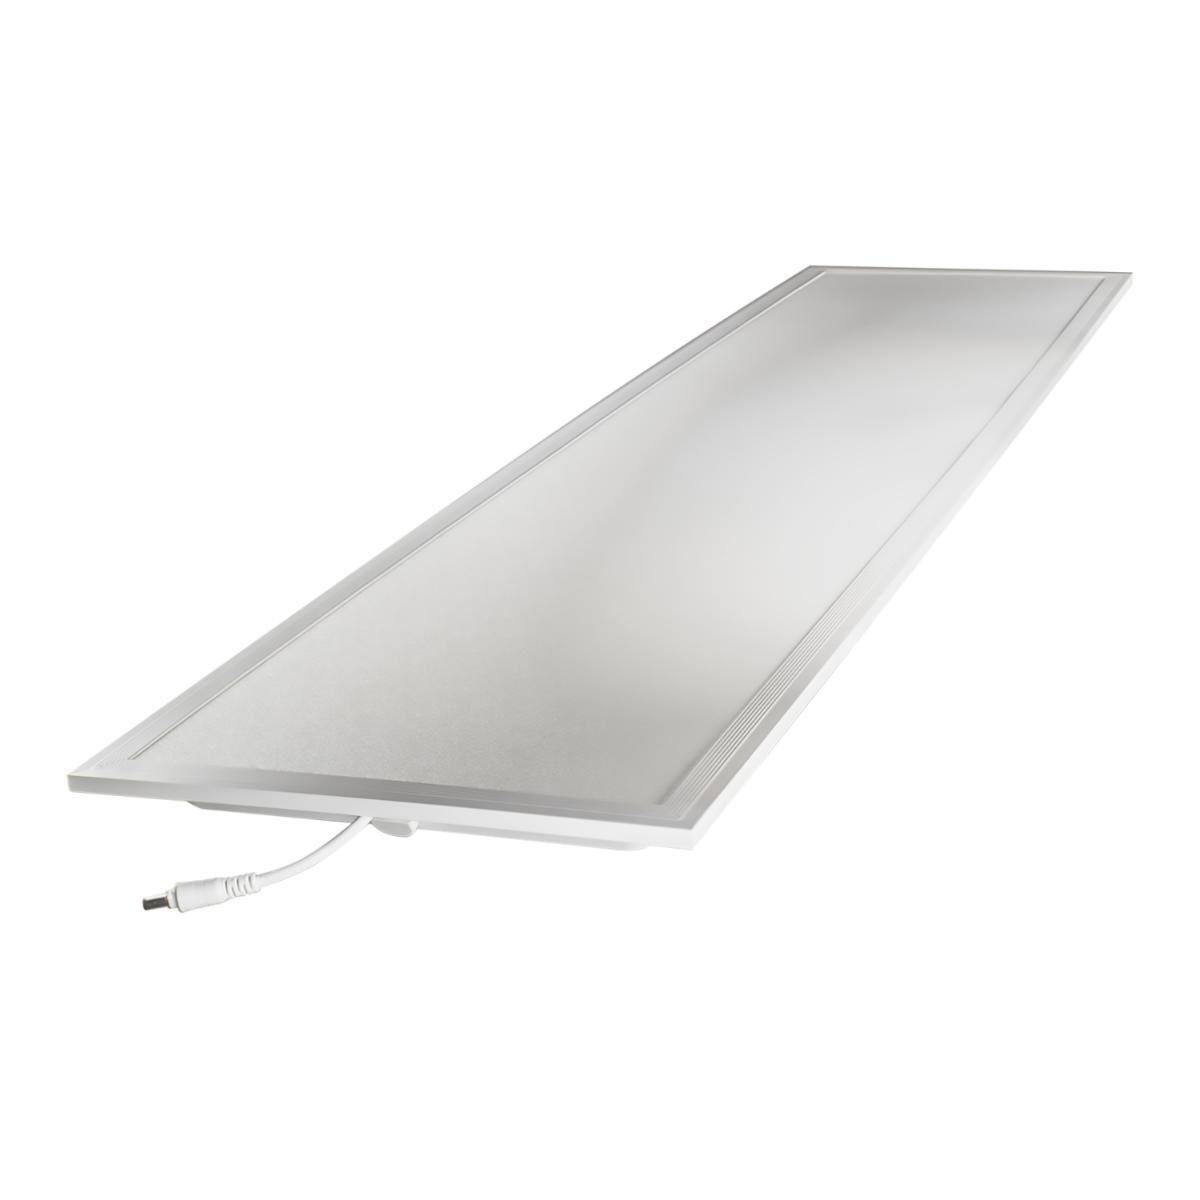 Noxion LED Panel Delta Pro V2.0 Xitanium DALI 30W 30x120cm 3000K 3960lm UGR <19 | Dali Dimbar - Varm Vit - Ersättare 2x36W